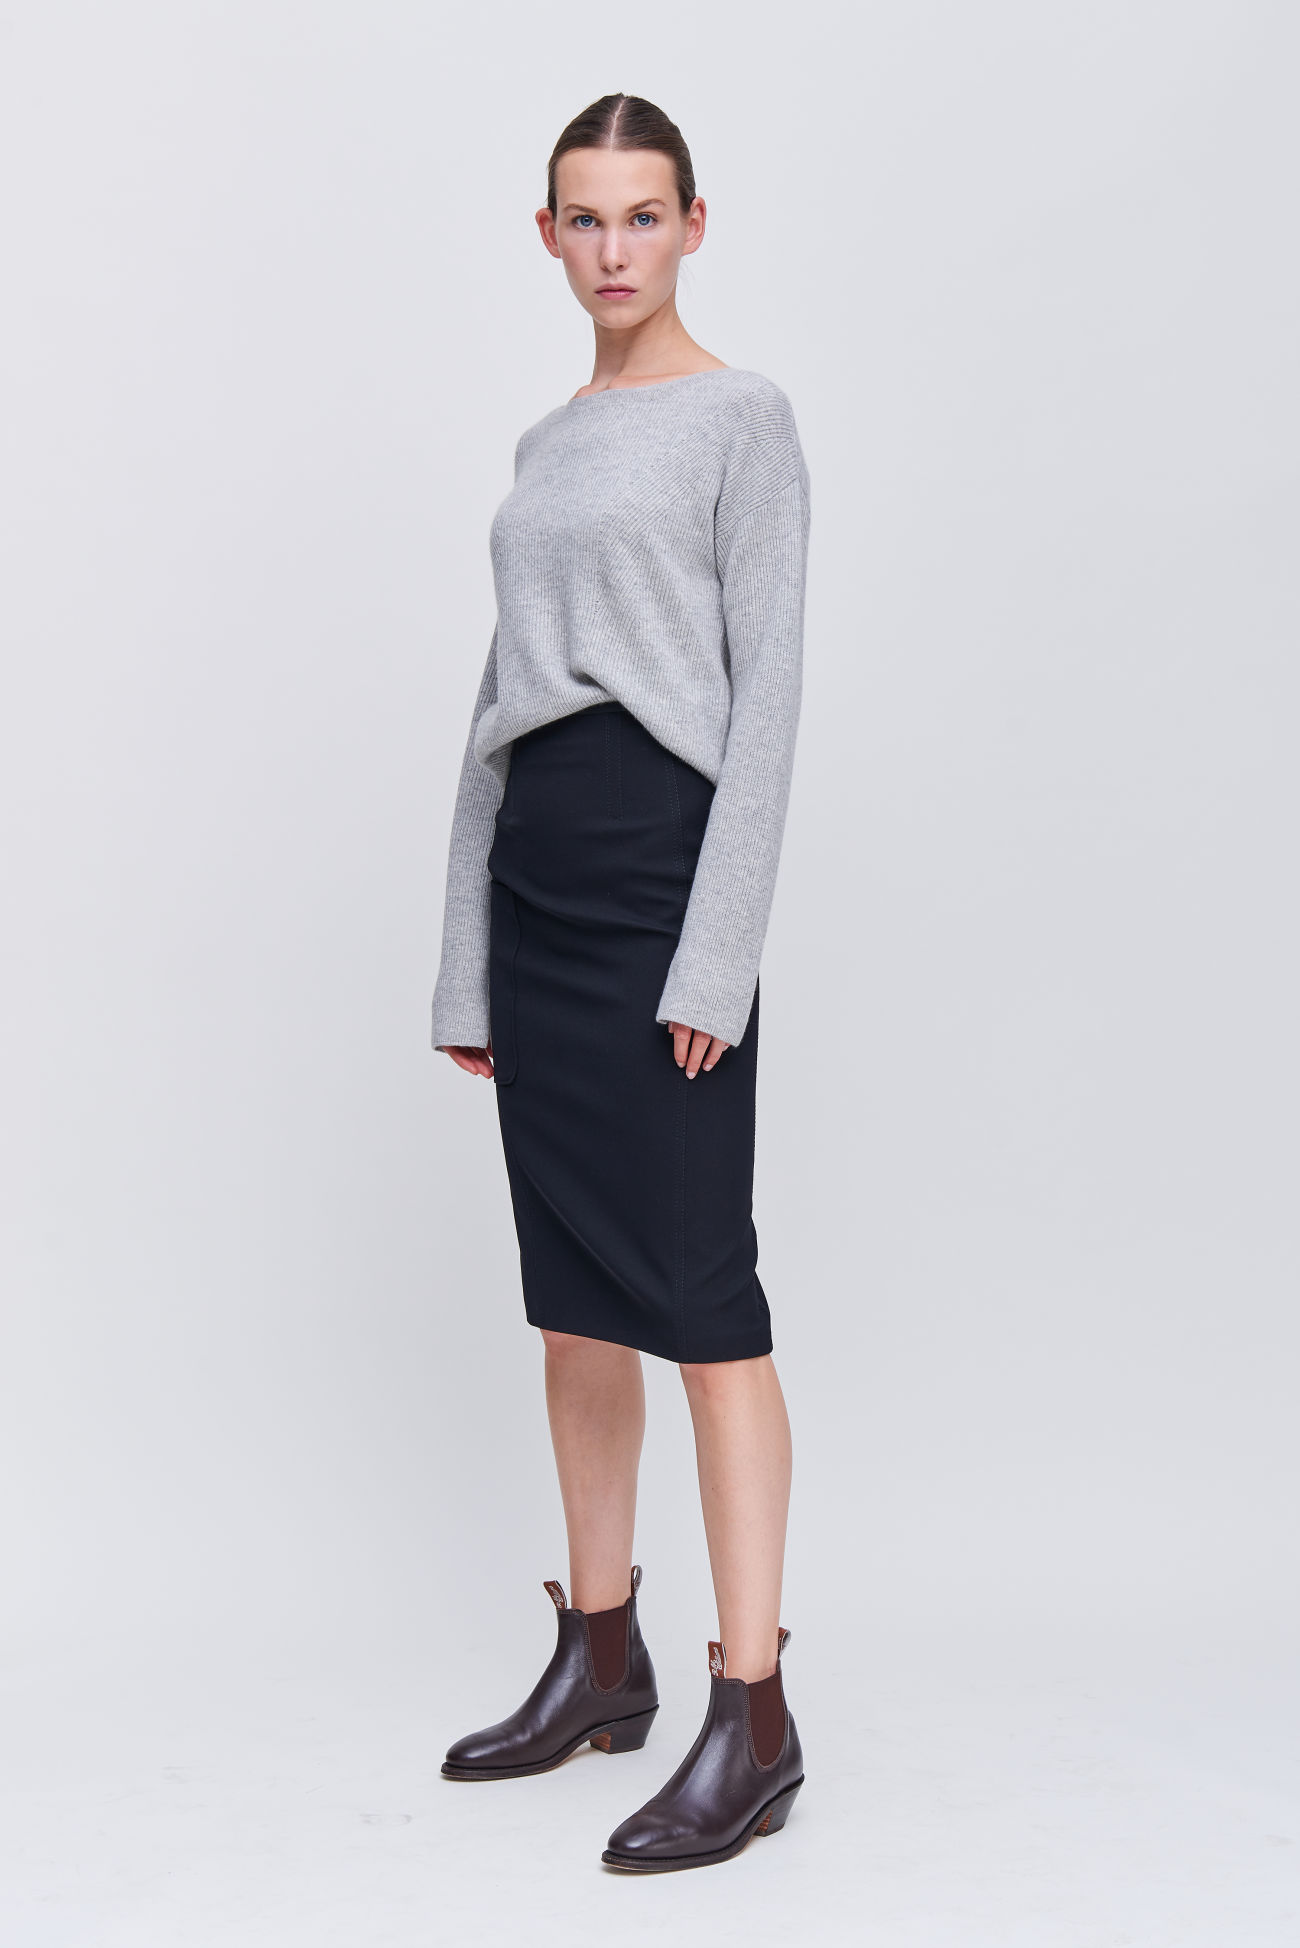 Cavalry twill skirt